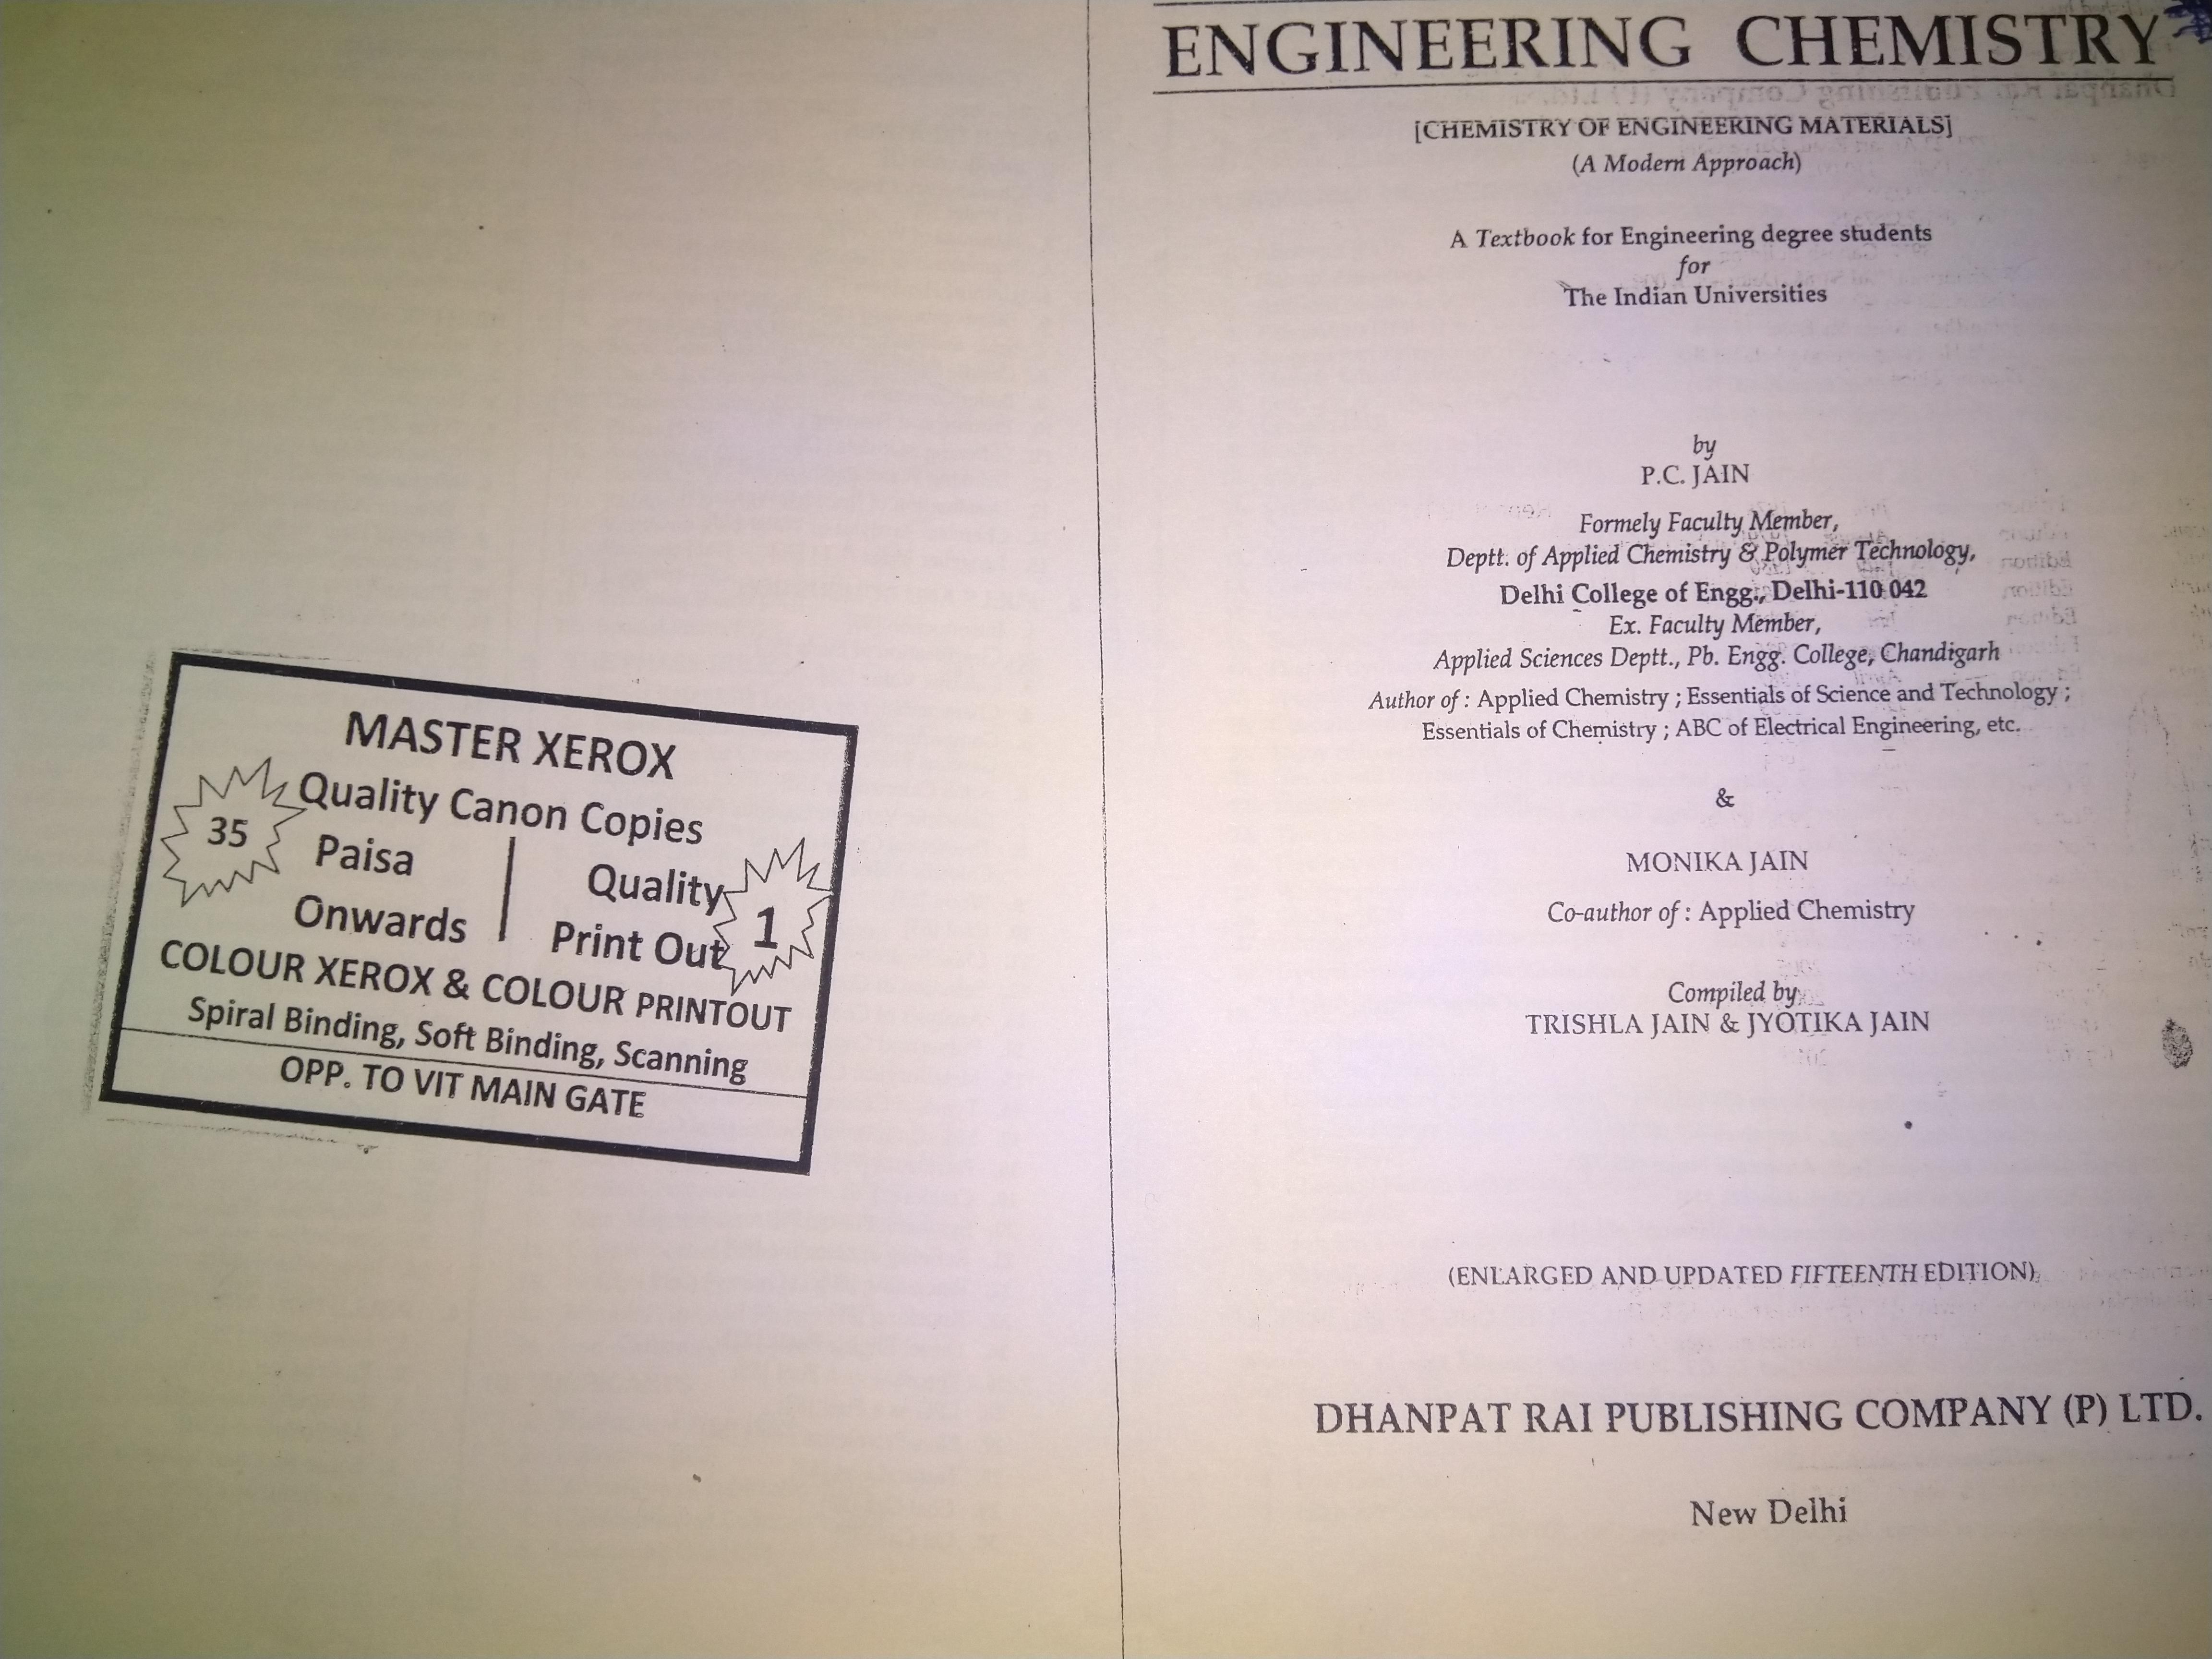 Engineering Chemistry, P.C.JAIN, DHANPAT RAI PUBLISHING COMPANY (P) LTD.